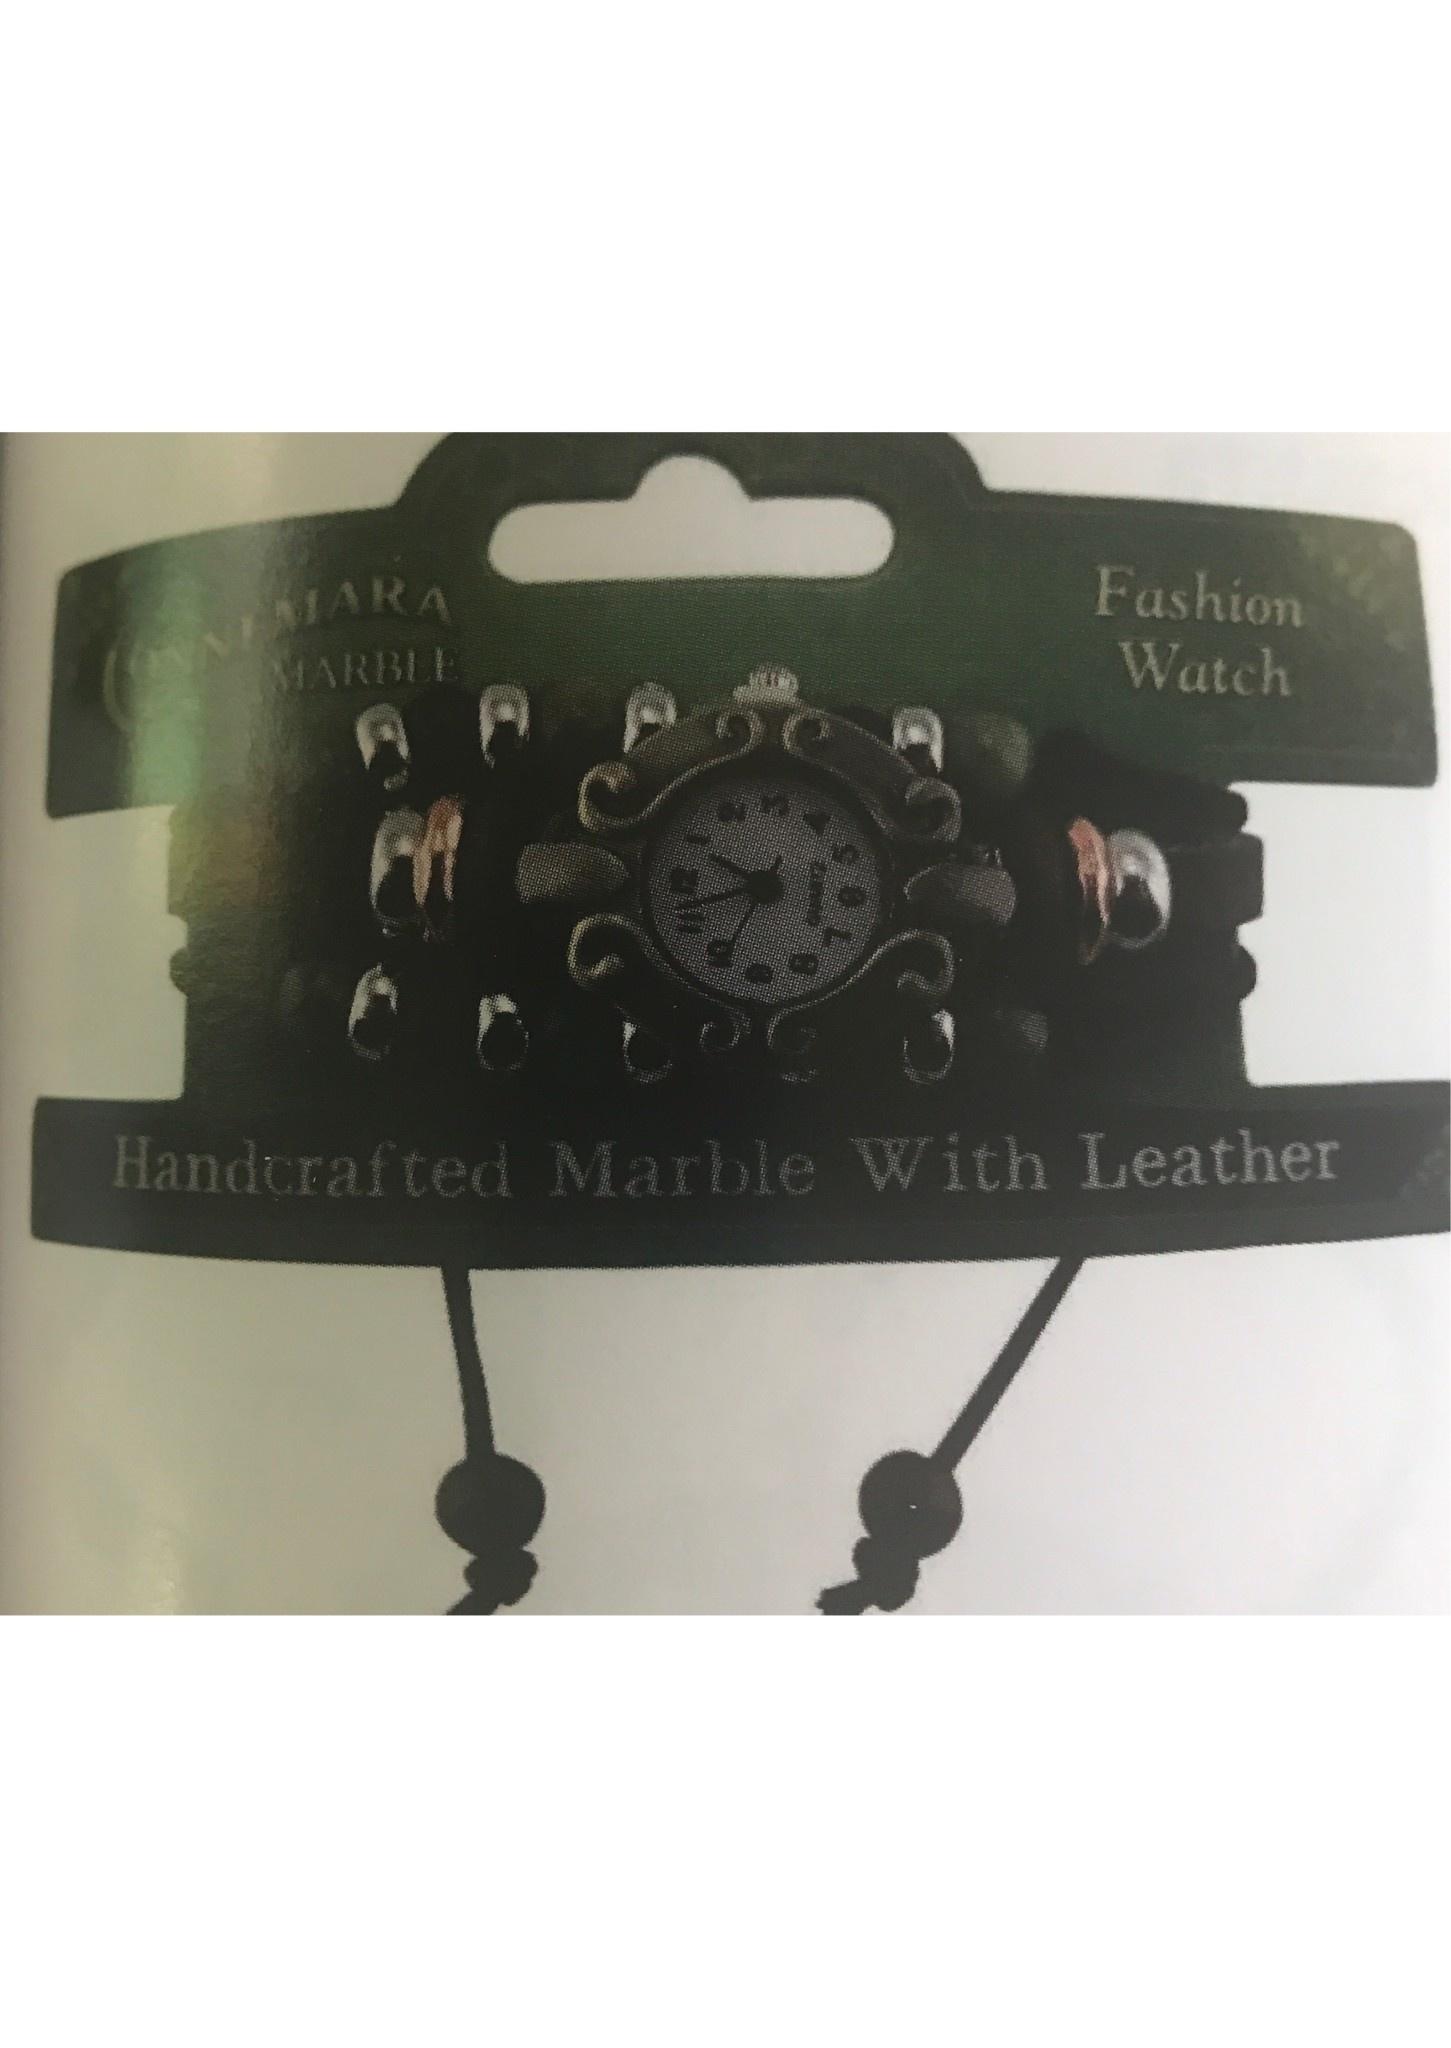 Connemara Marble Watch: Connemara Marble, Leather